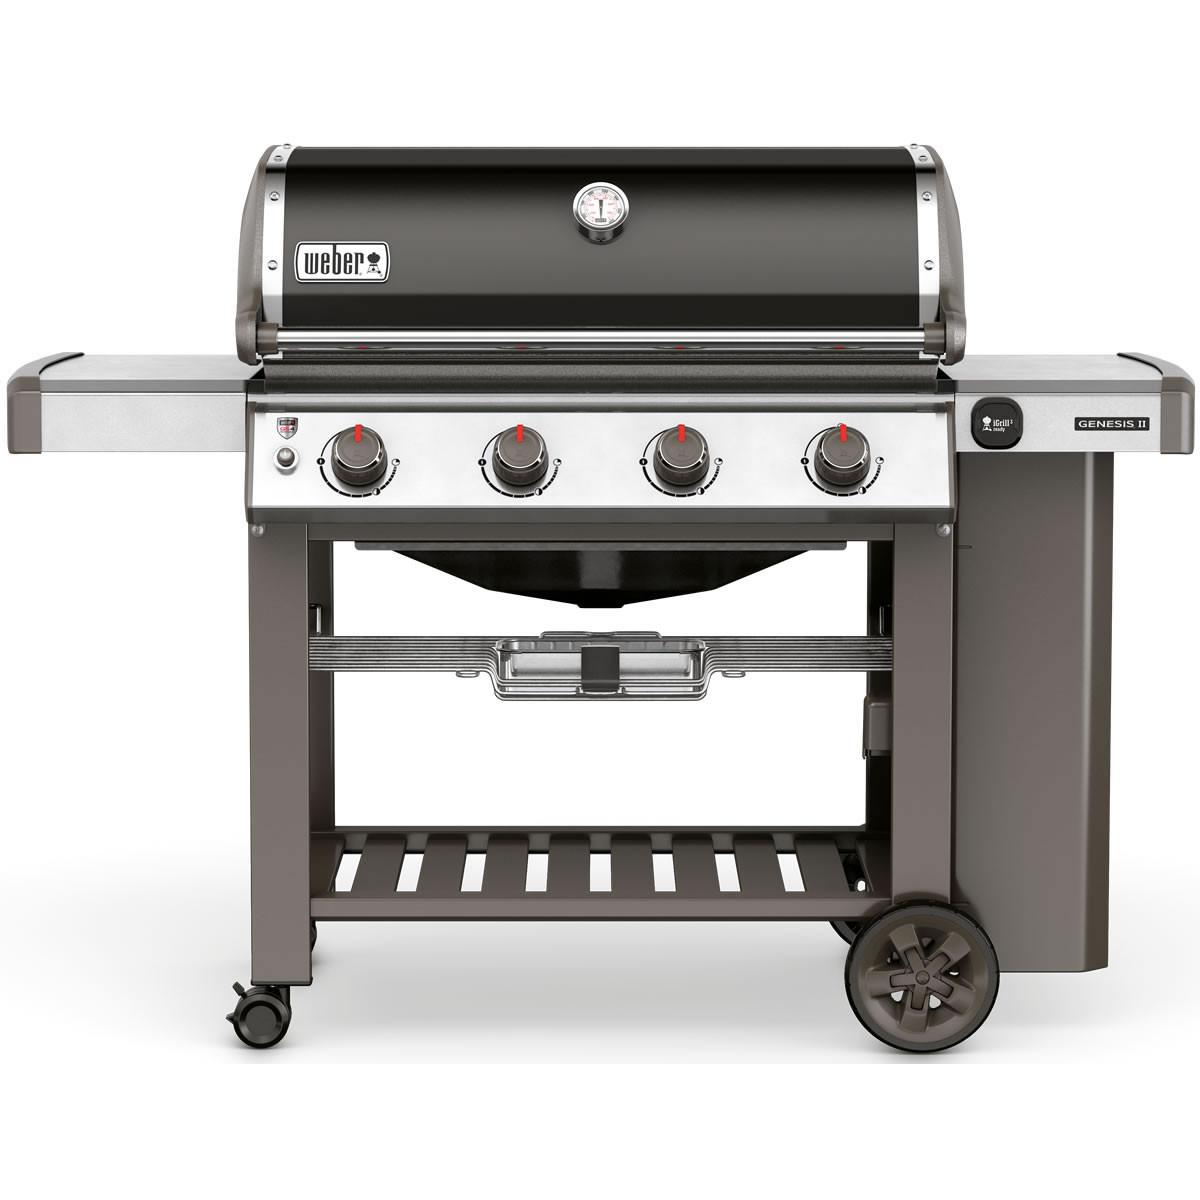 Weber Genesis II E-410 GBS Black Gas Barbecue 62010174